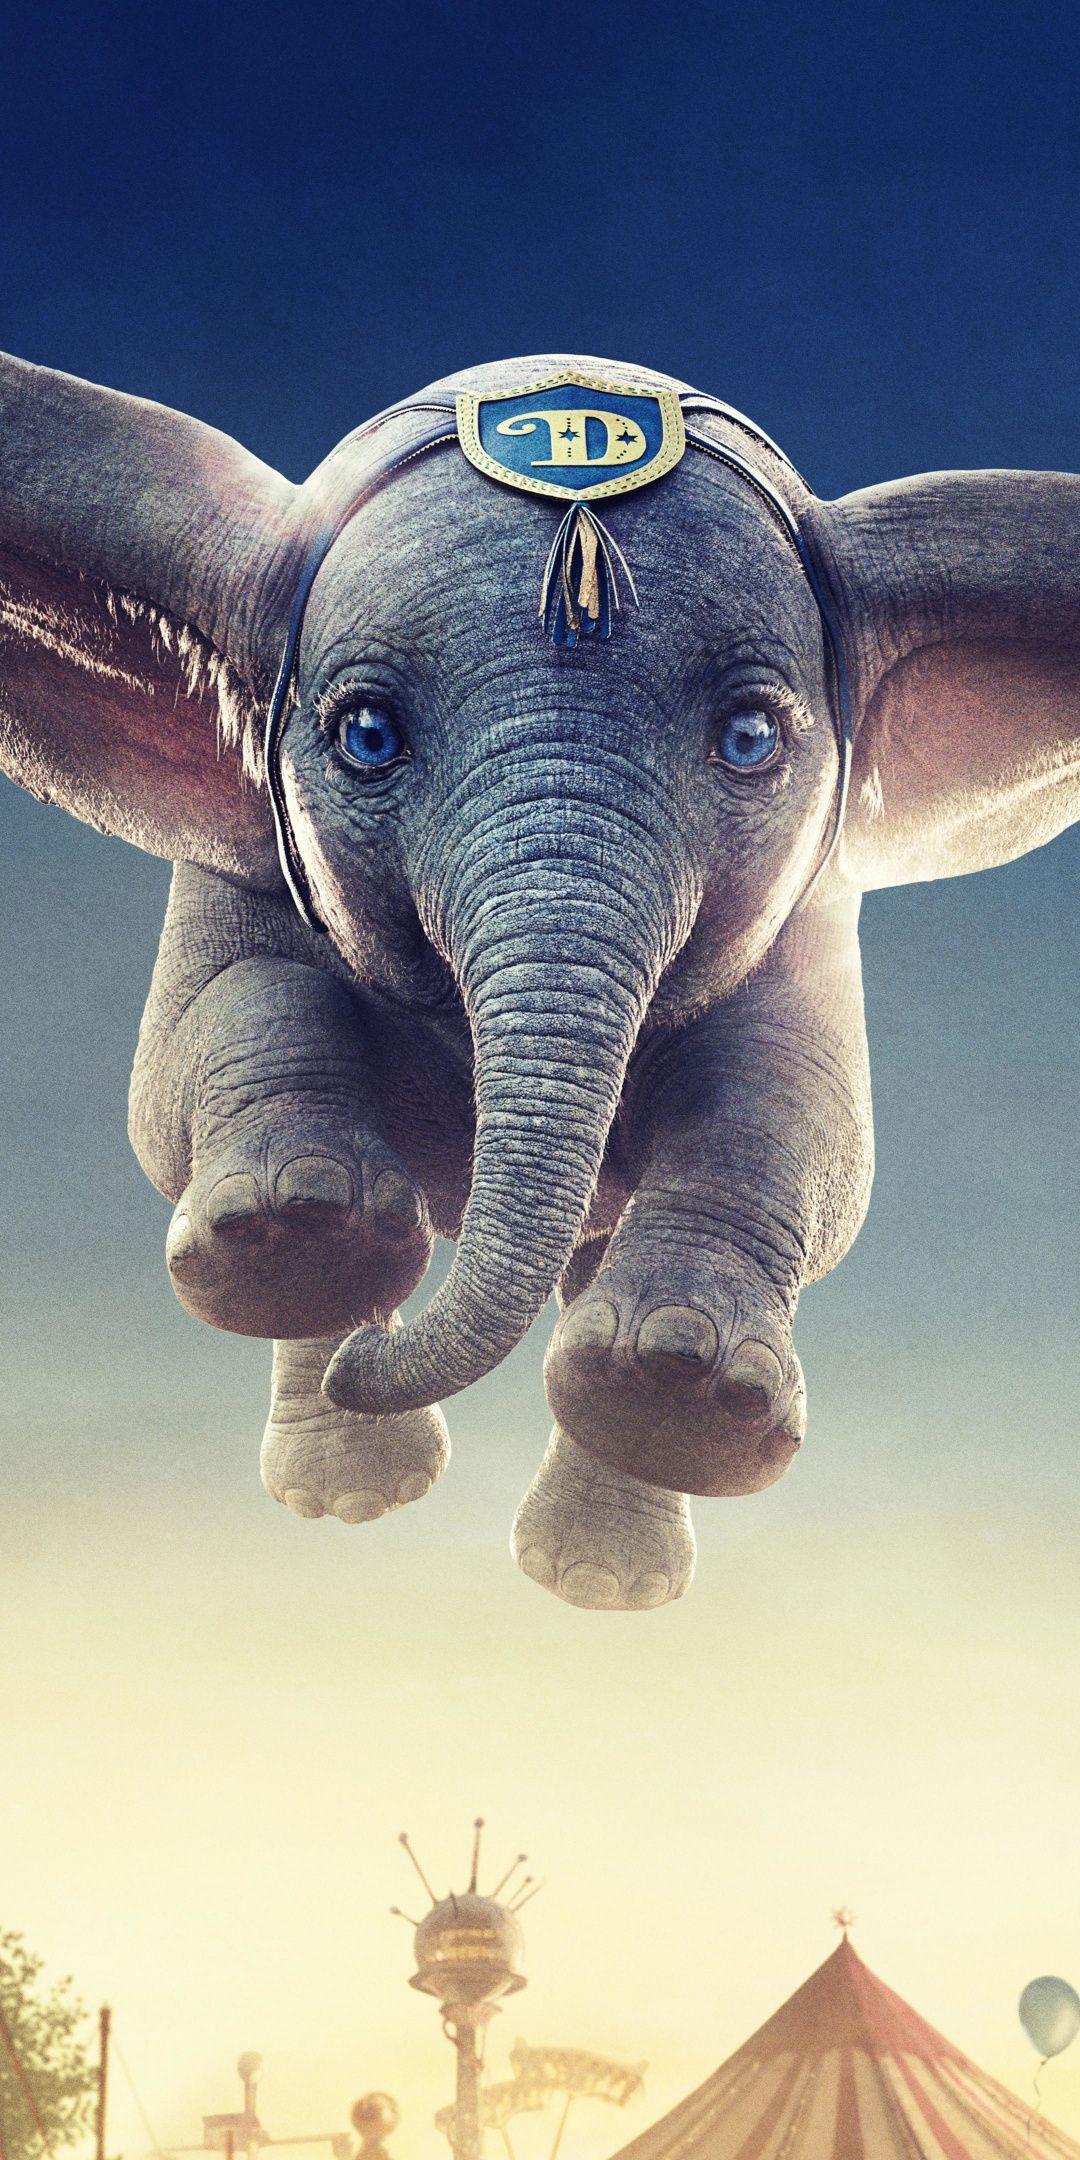 Flying Elephant Dumbo 2019 Movie Wallpaper Elephant Movie Wallpapers Flying Elephant